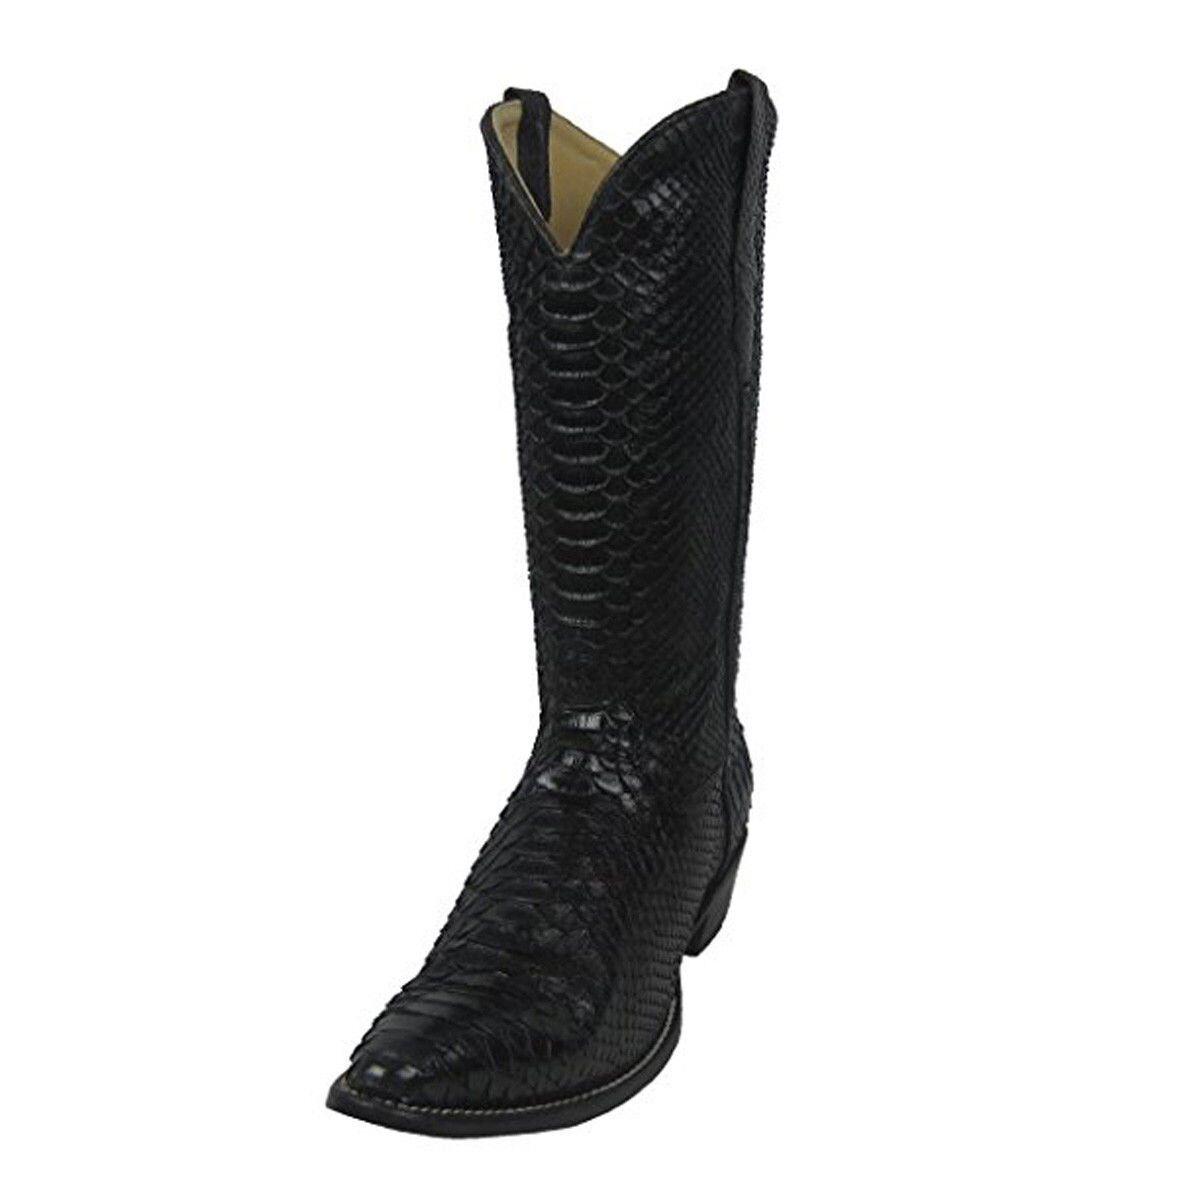 CORRAL Men's Black Python Round Toe Cowboy Boots C2942